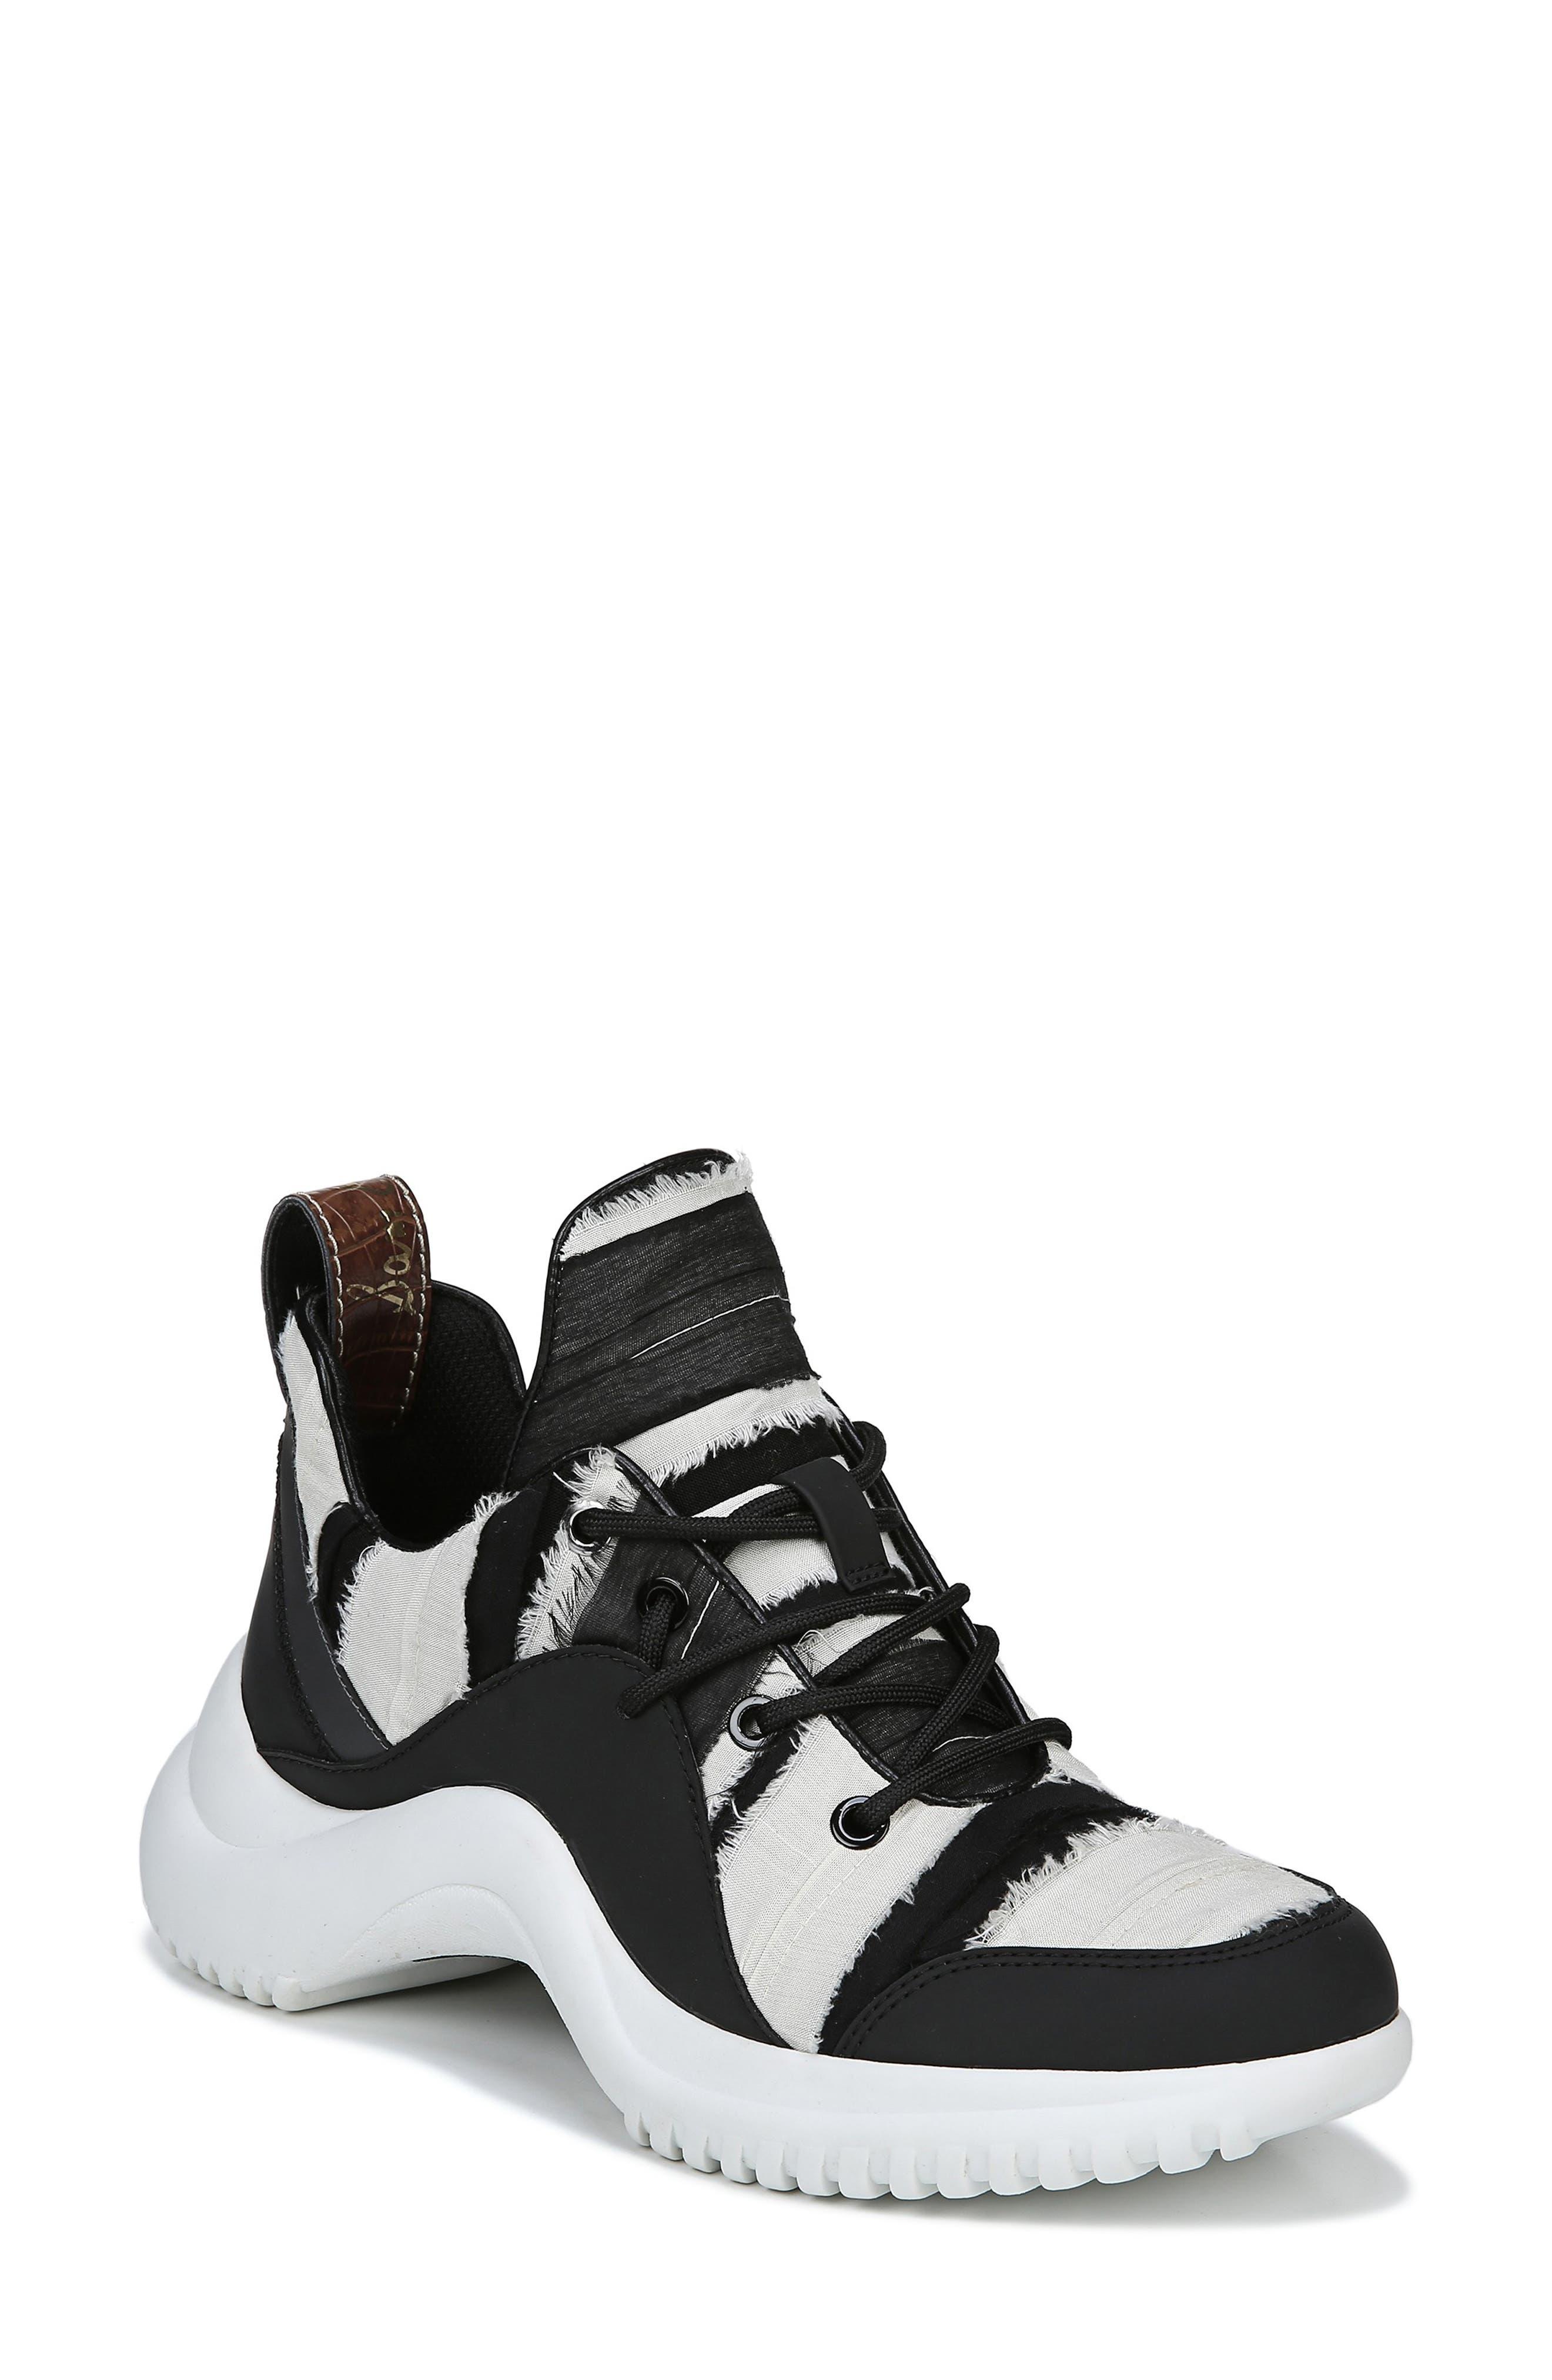 SAM EDELMAN Women'S Meena Low-Top Sneakers in Black/ Ivory Fabric